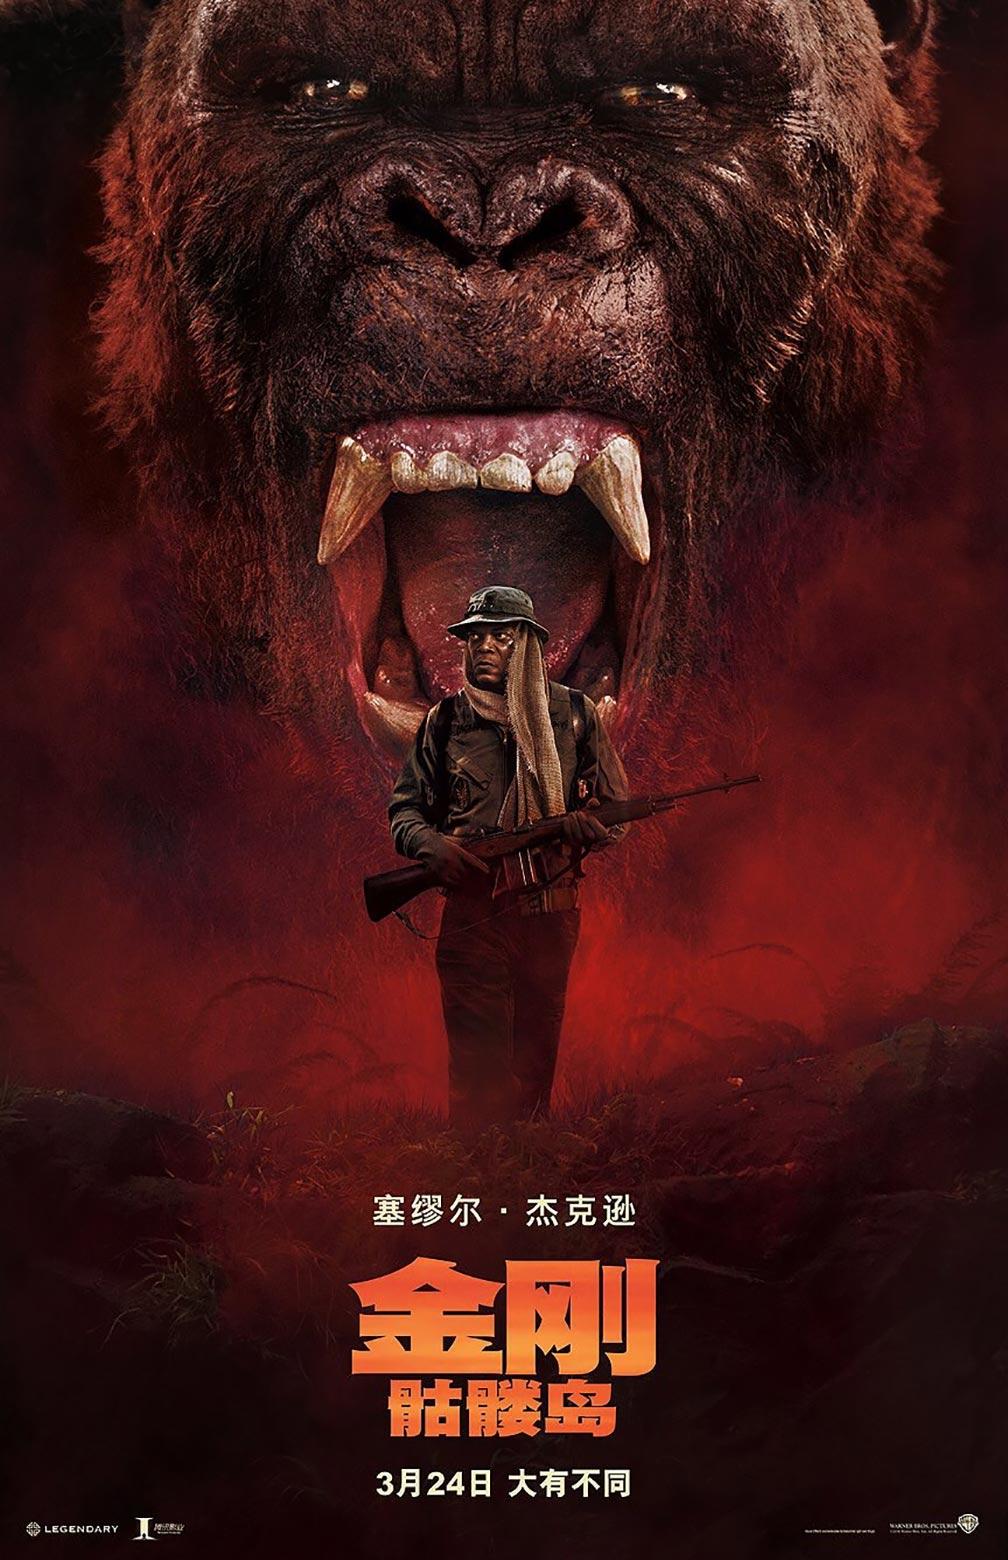 Kong: Skull Island (2017) Poster #18 - Trailer Addict